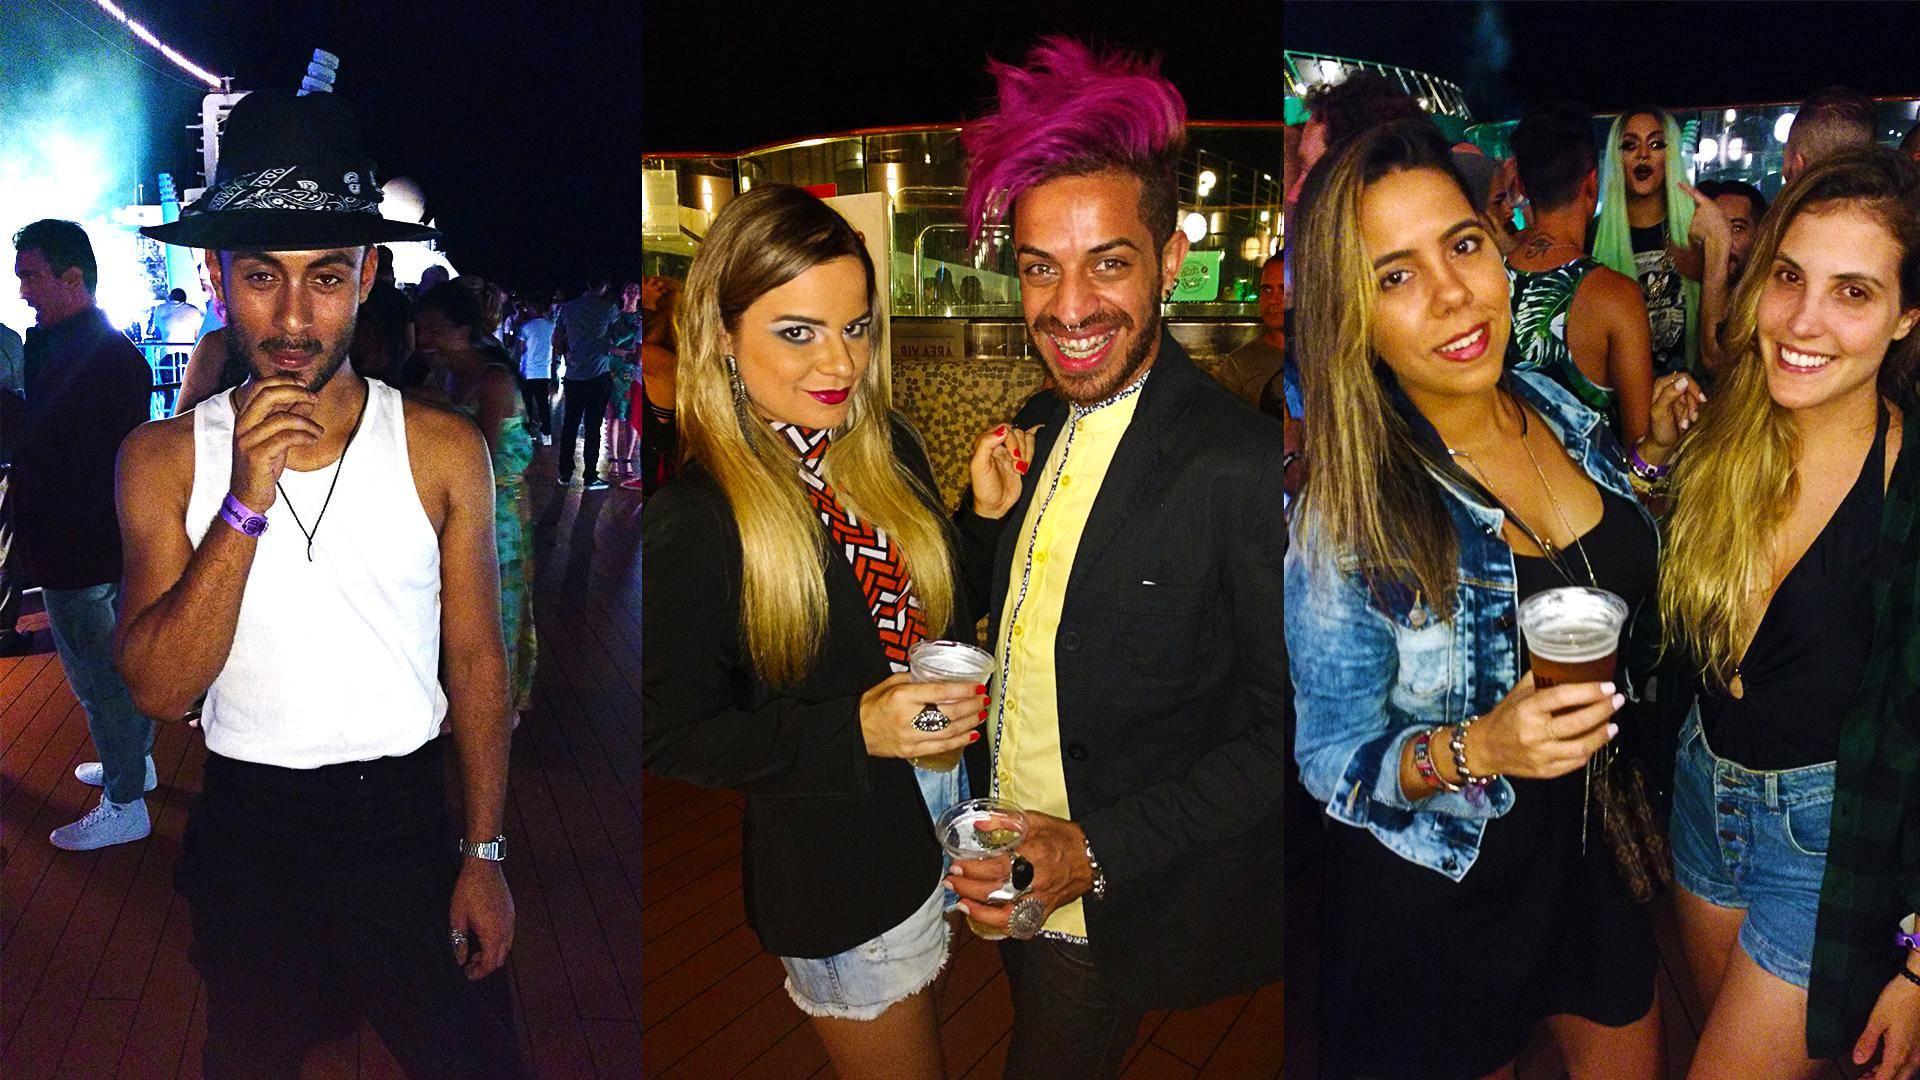 www.juicysantos.com.br - cruzeiro fashion chilli beans 2016